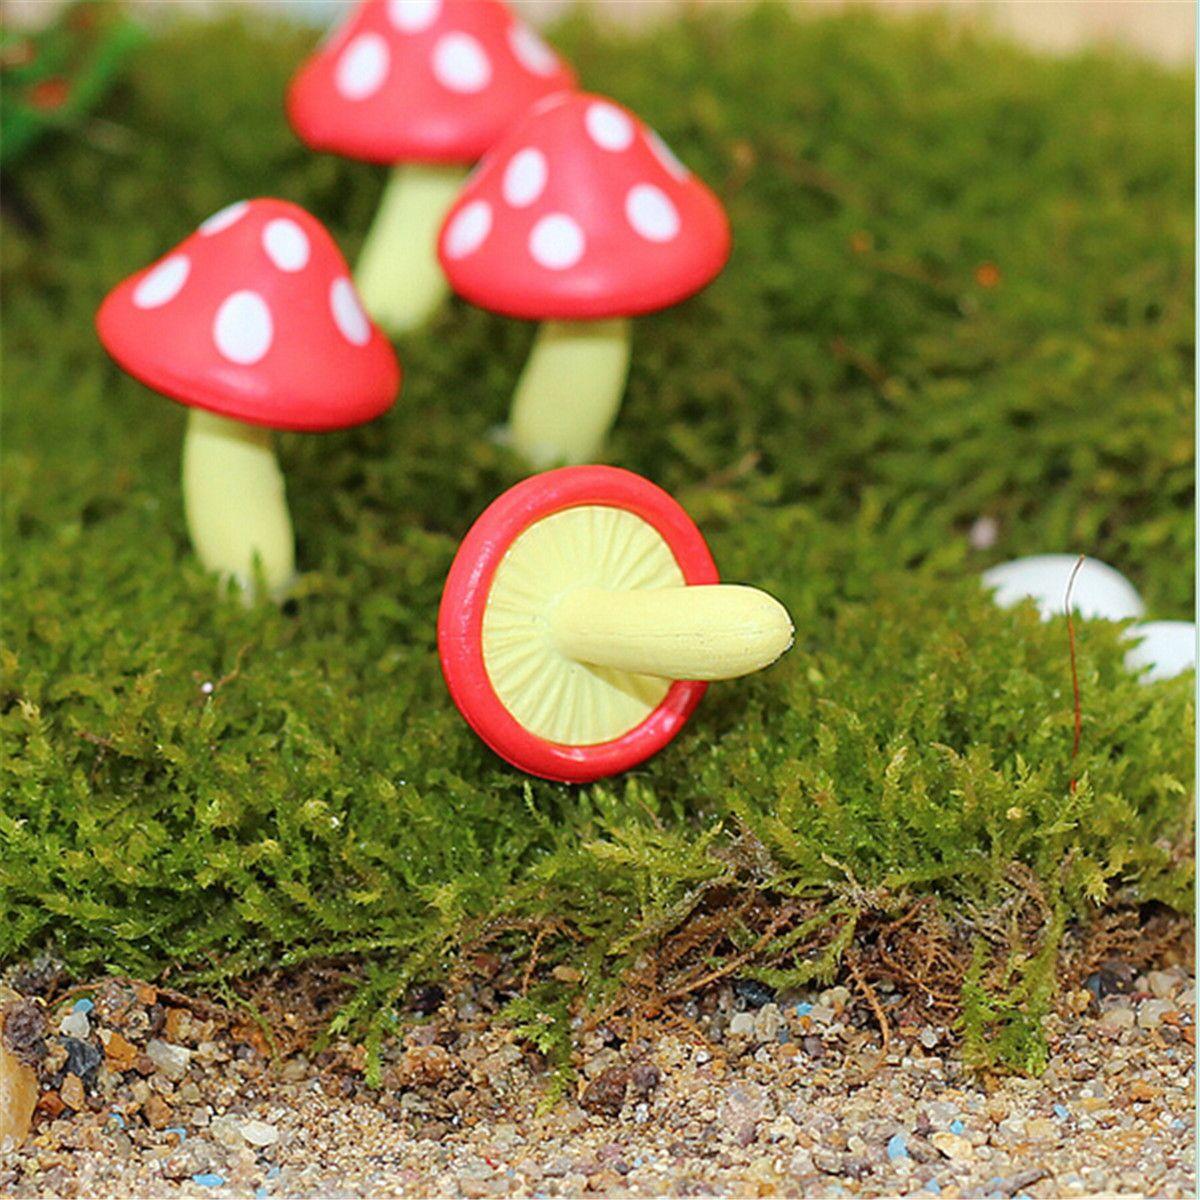 Micro Mushroom Ornament Potted Plant Landscape Garden DIY Decor ...